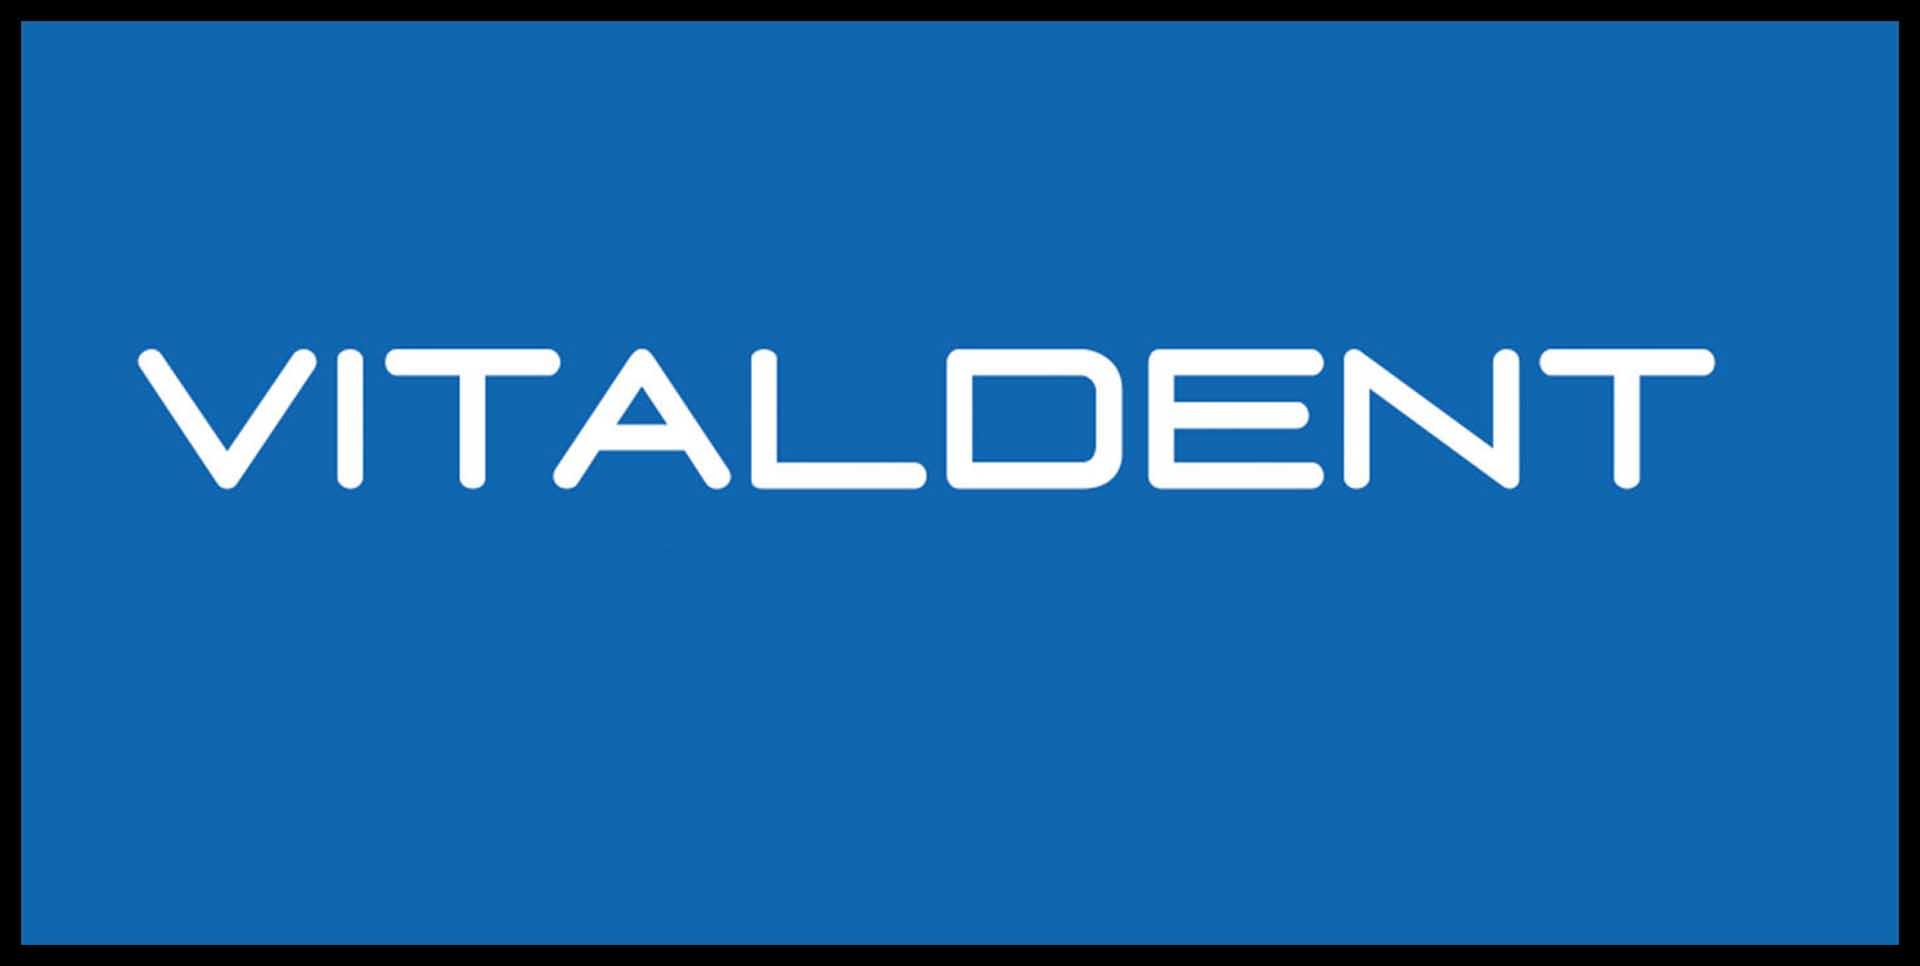 empresas del sector dental vitaldent